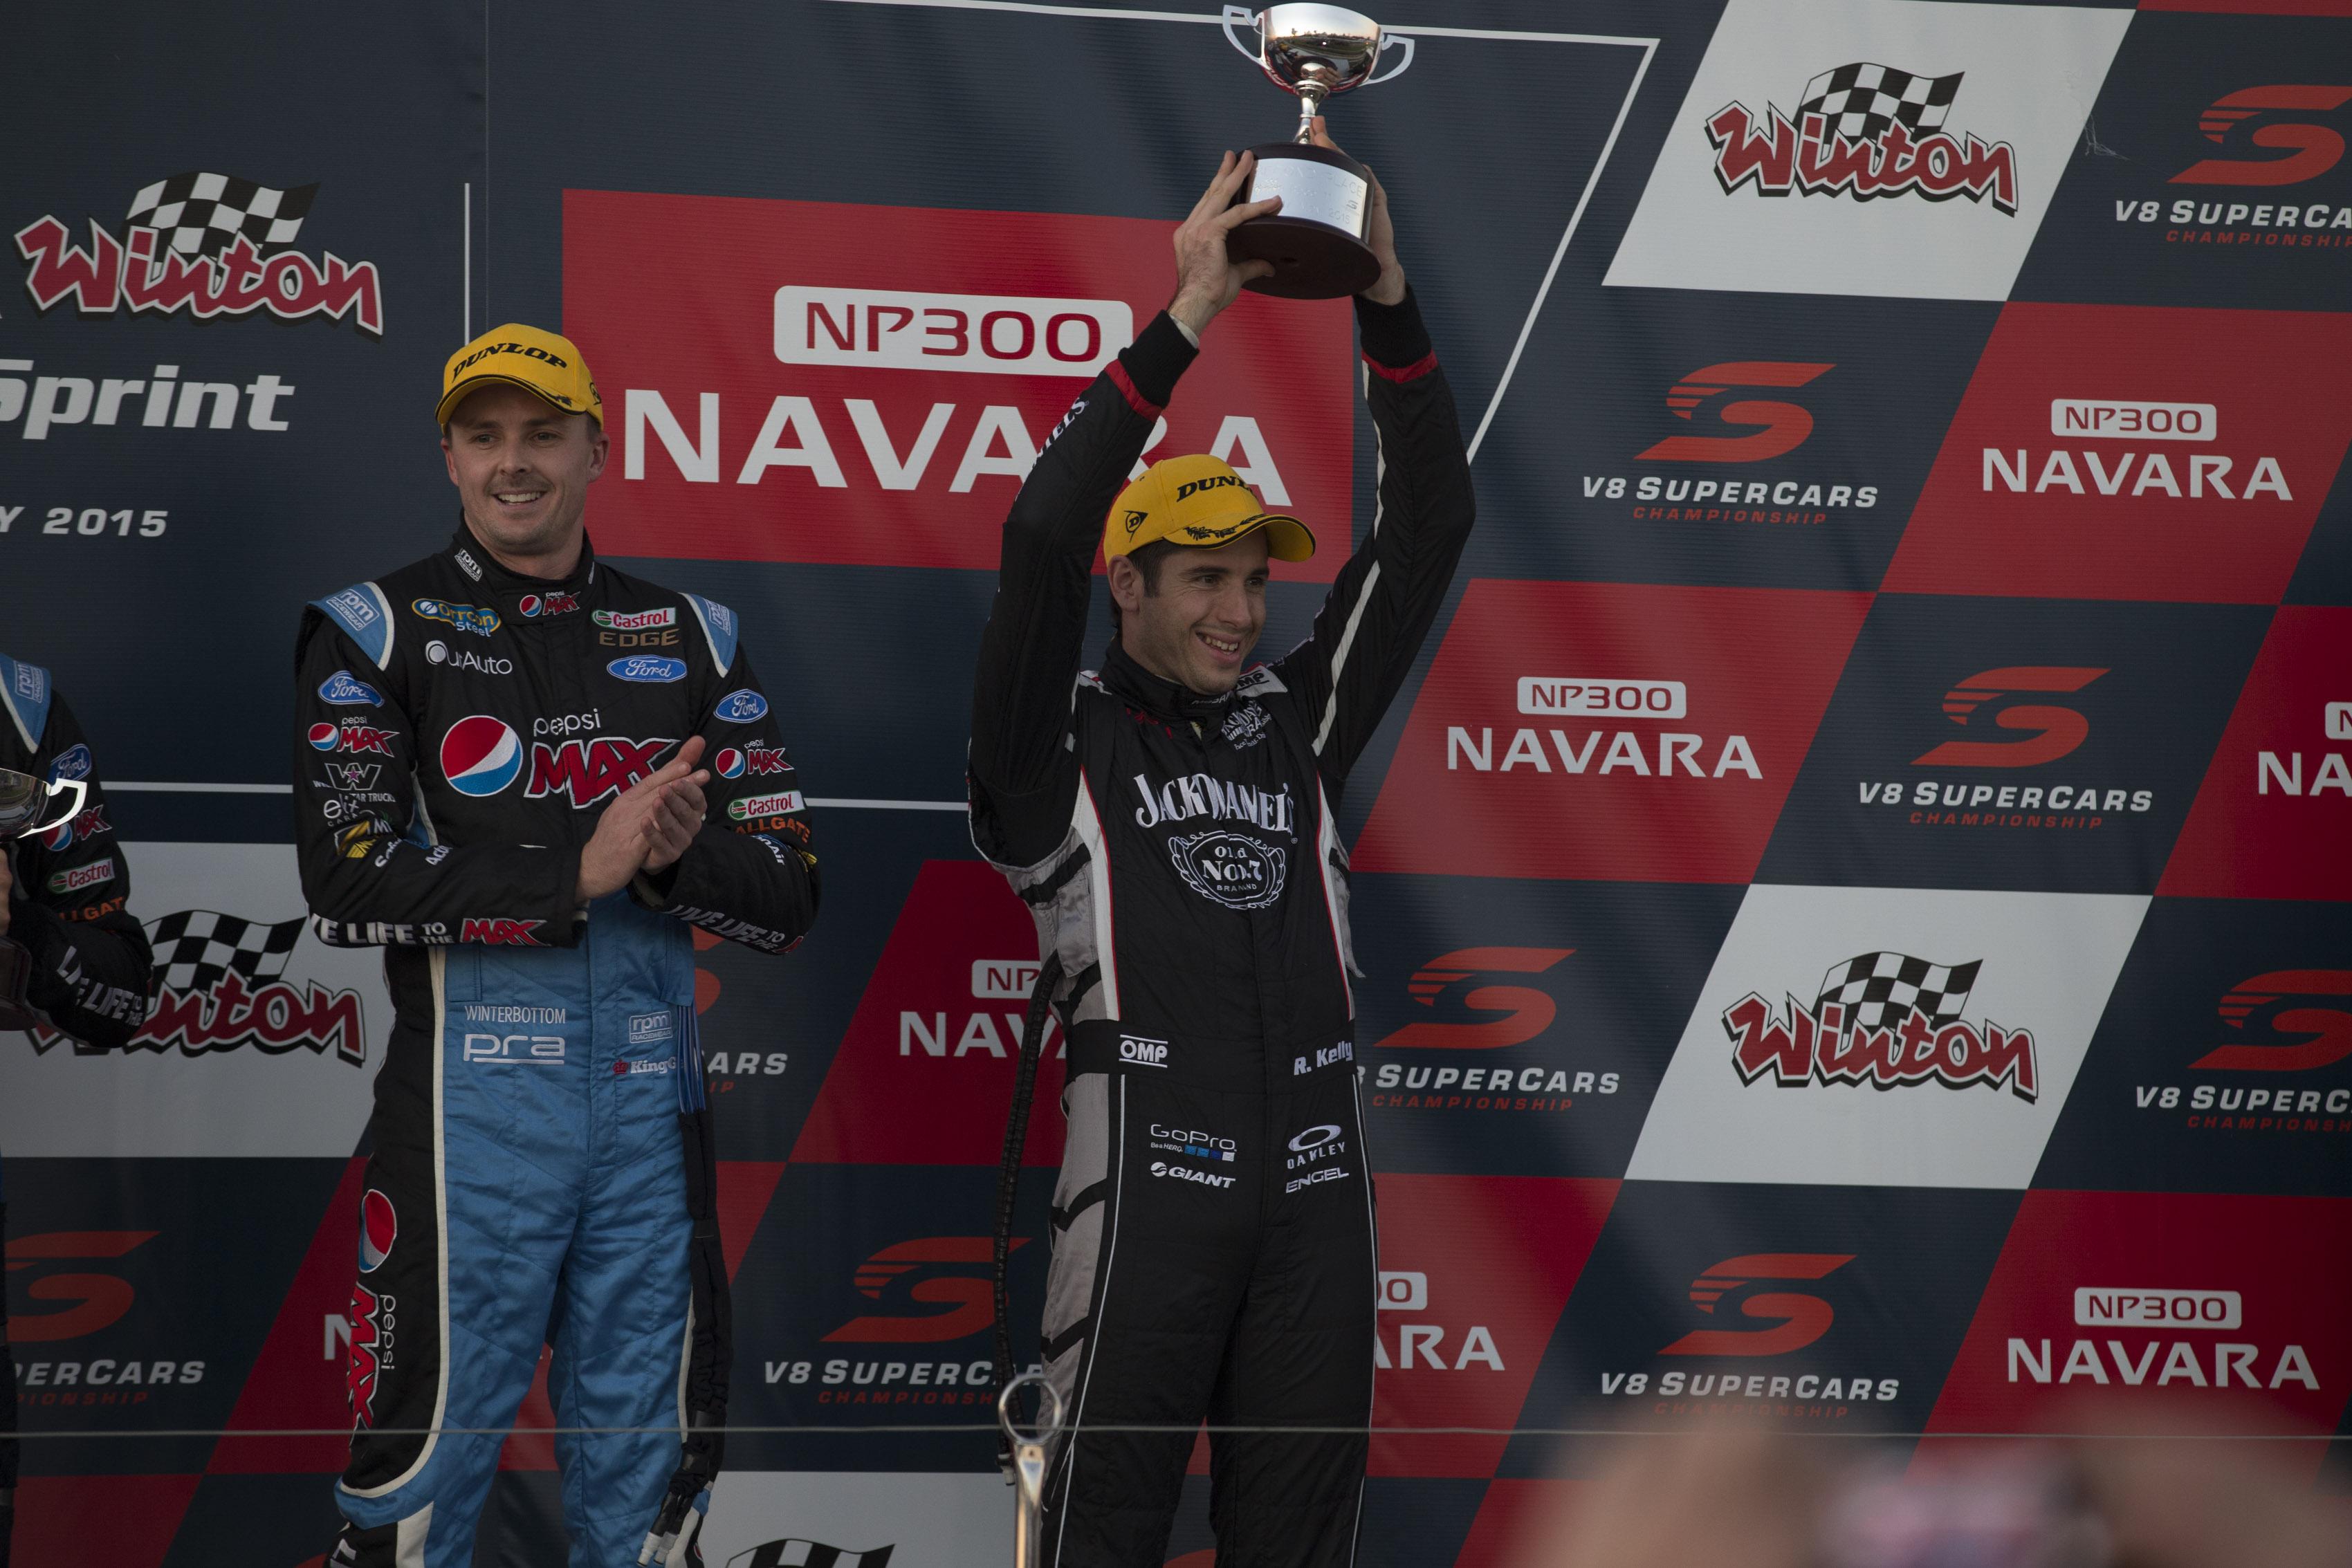 at the NP300 Navara Winton SuperSprint, Event 04 of the 2015 Australian V8 Supercar Championship Series at the Winton Motor Raceway, Winton, May 16, 2015.